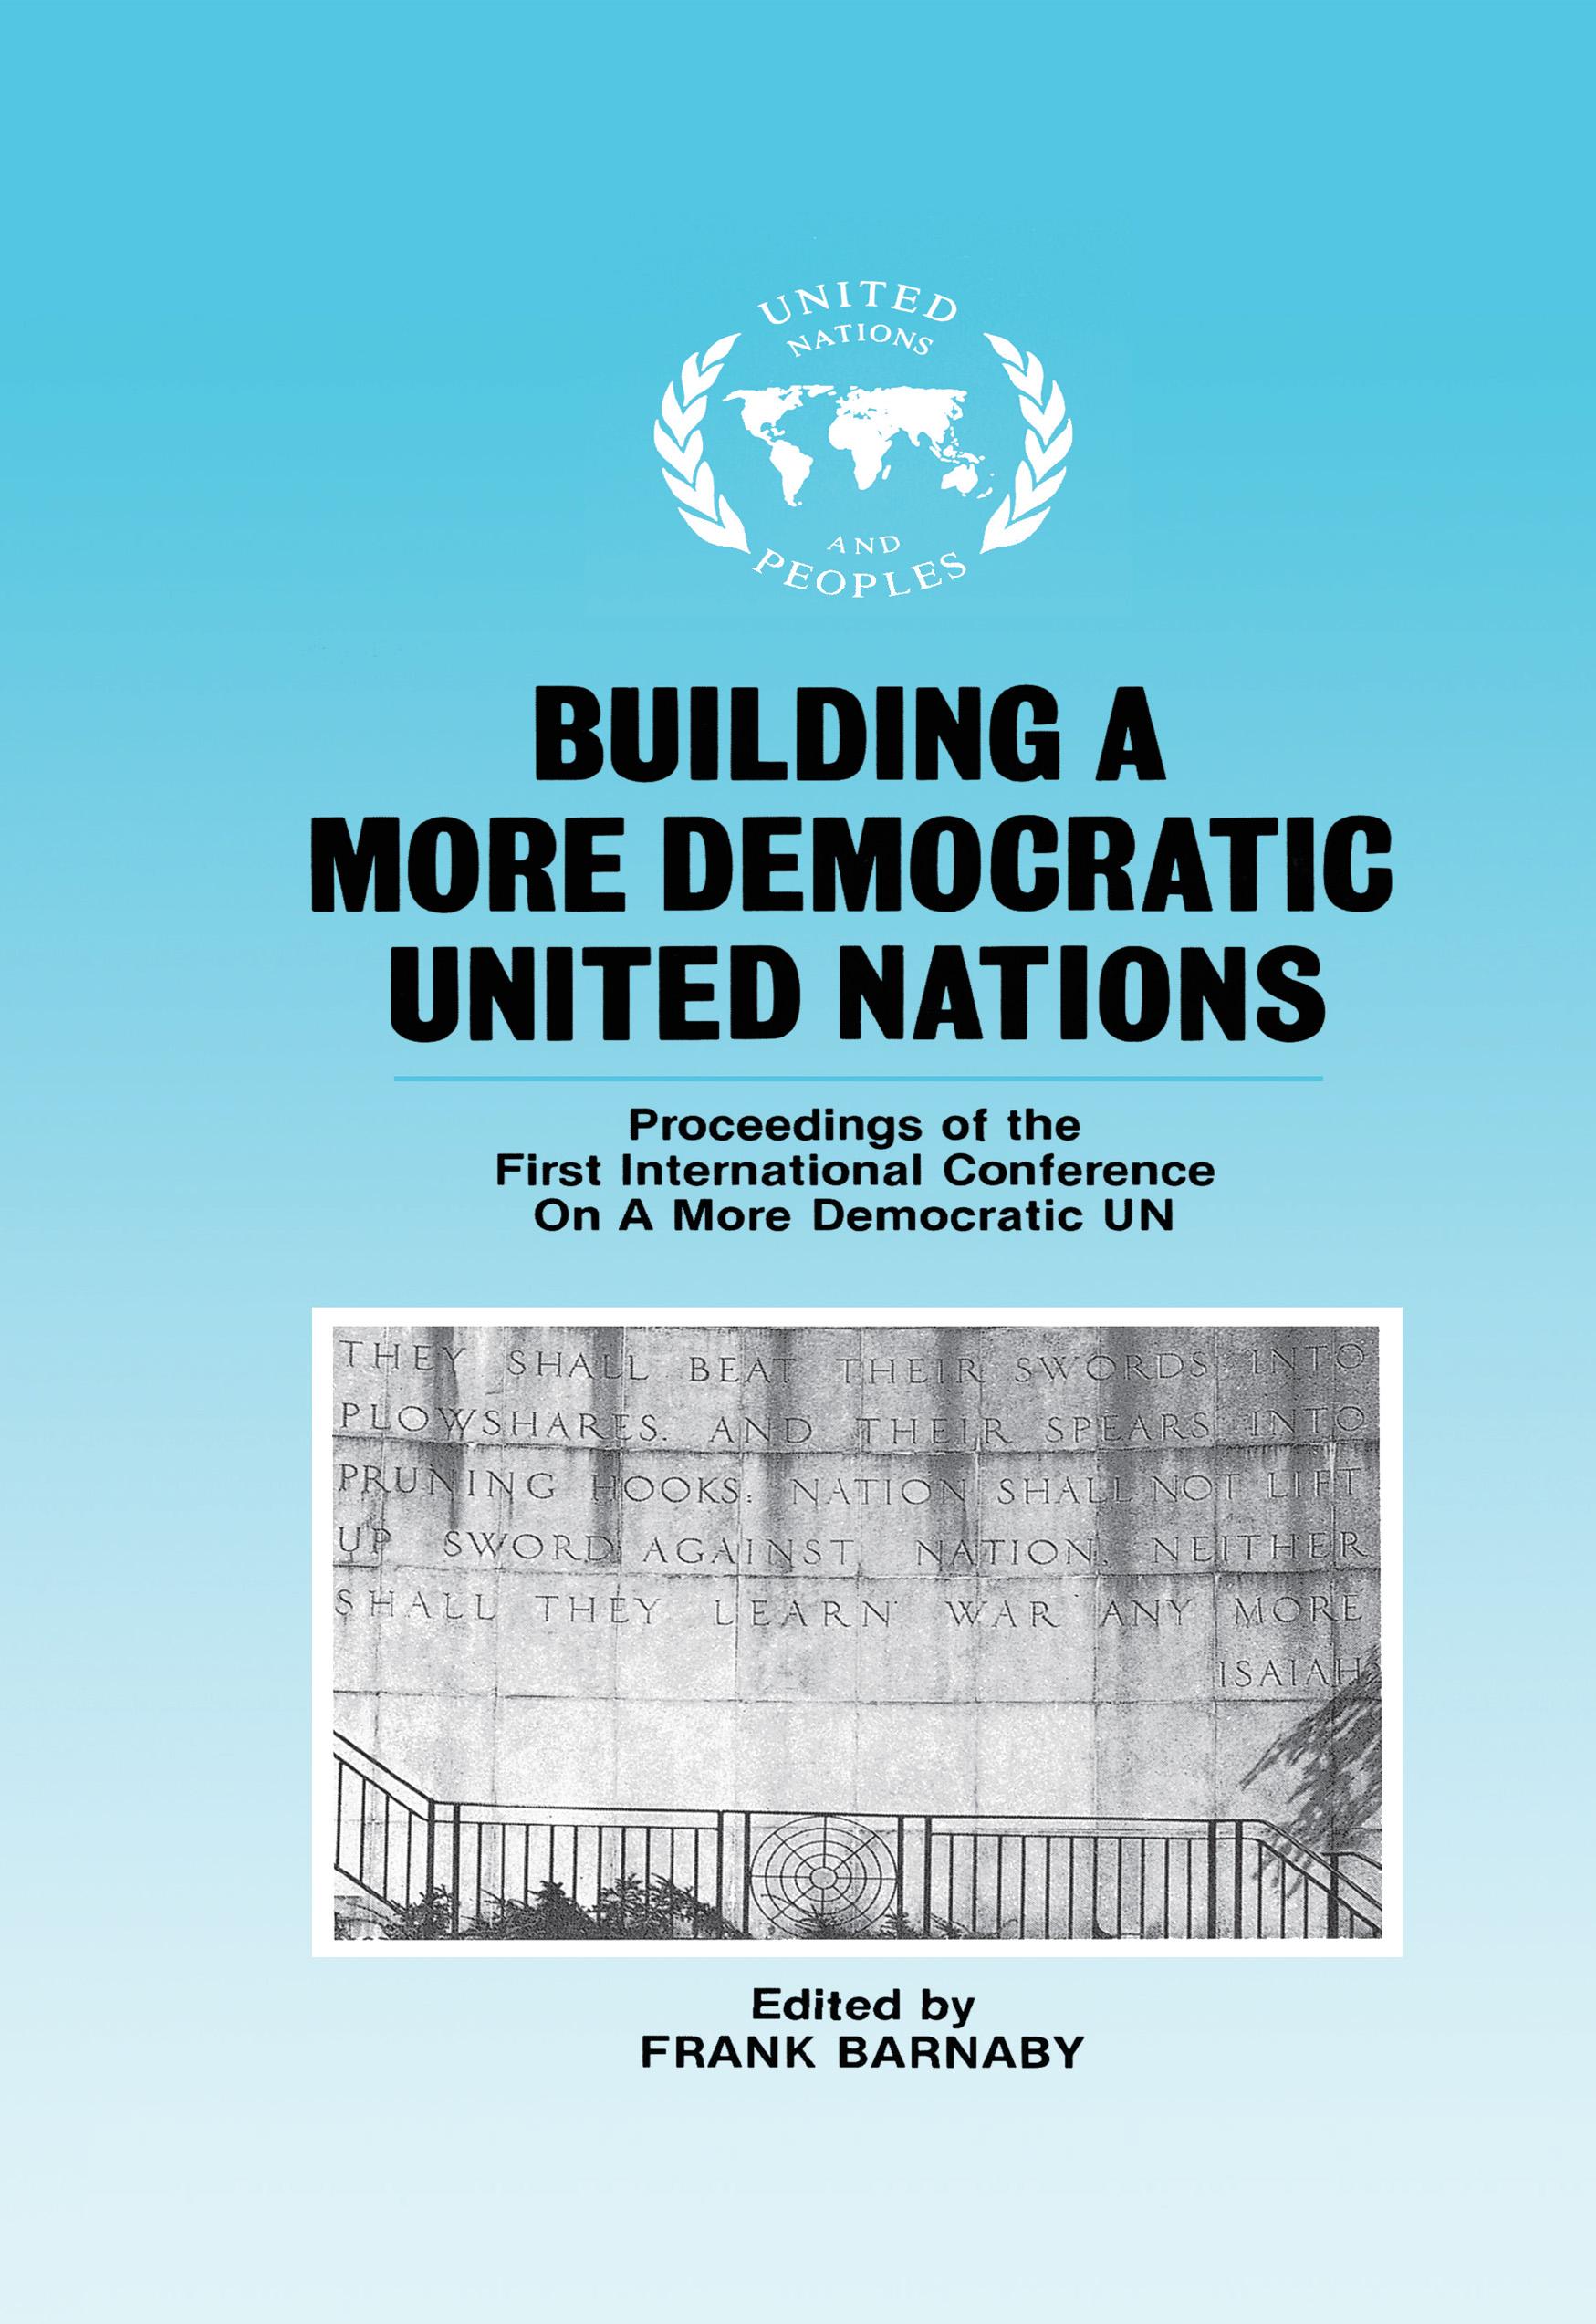 Building A More Democratic UNITED NATIONS